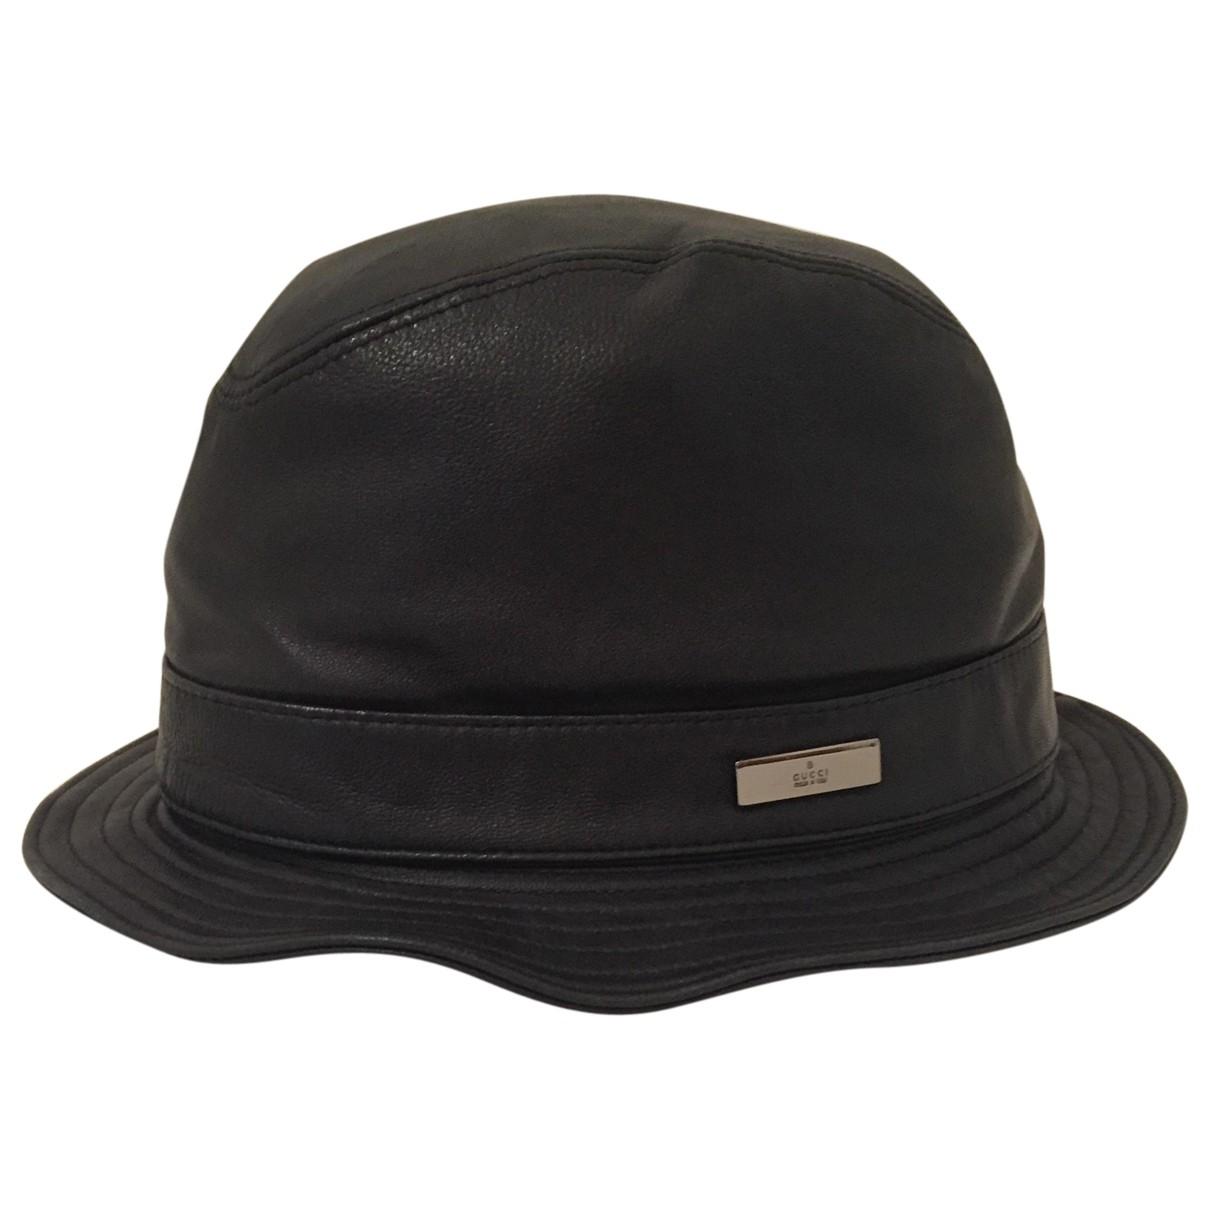 Gucci \N Black Leather hat & pull on hat for Men M International